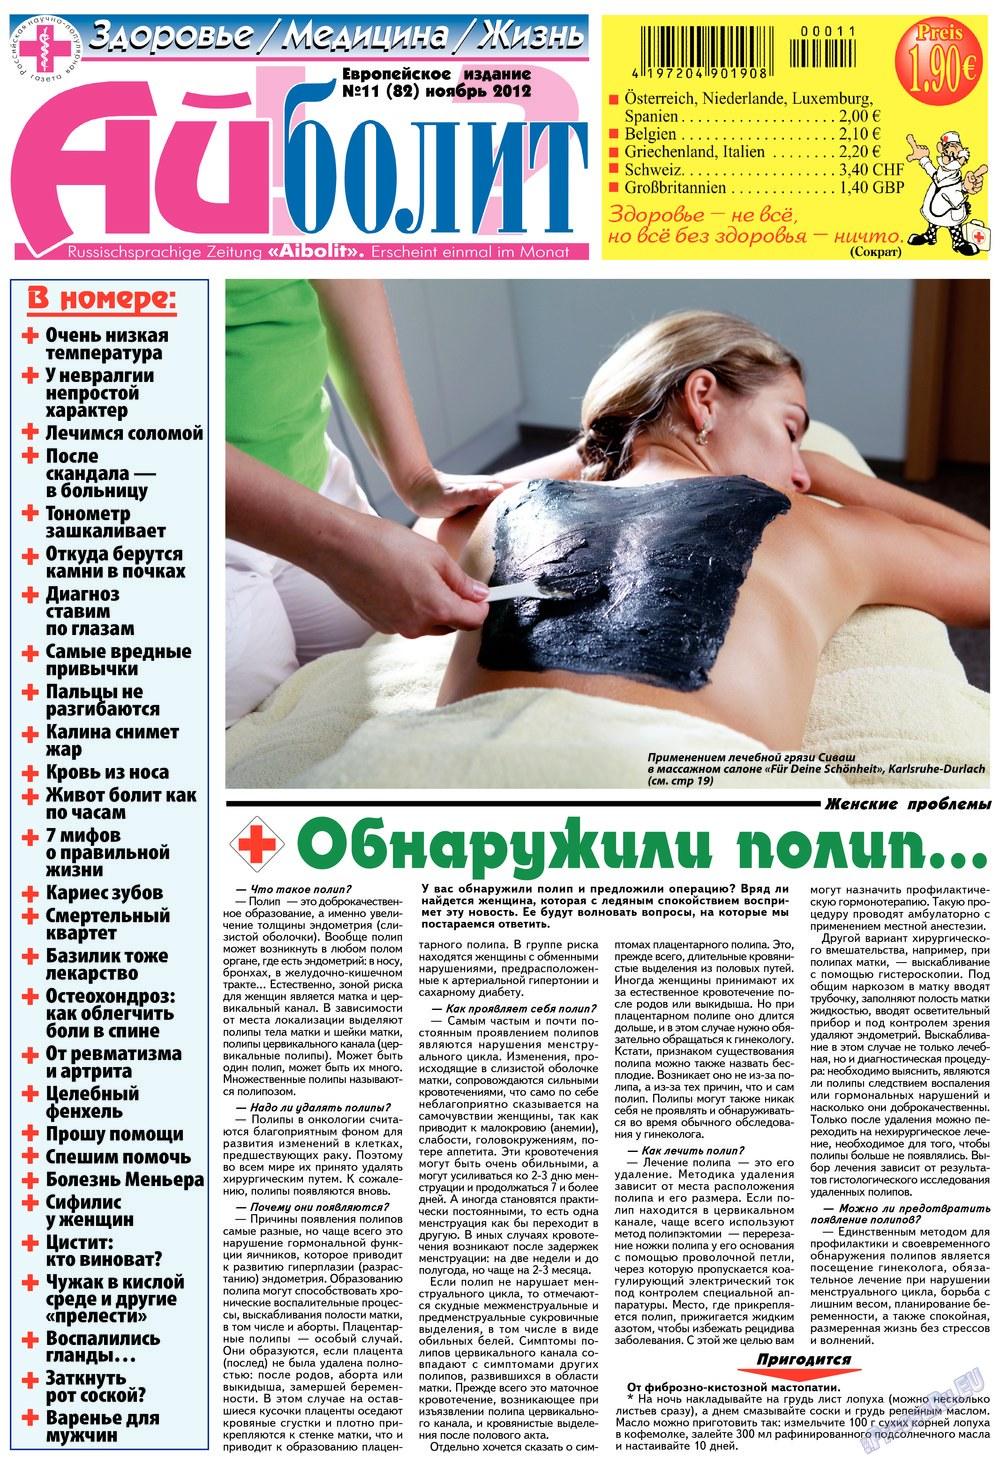 АйБолит (газета). 2012 год, номер 11, стр. 1